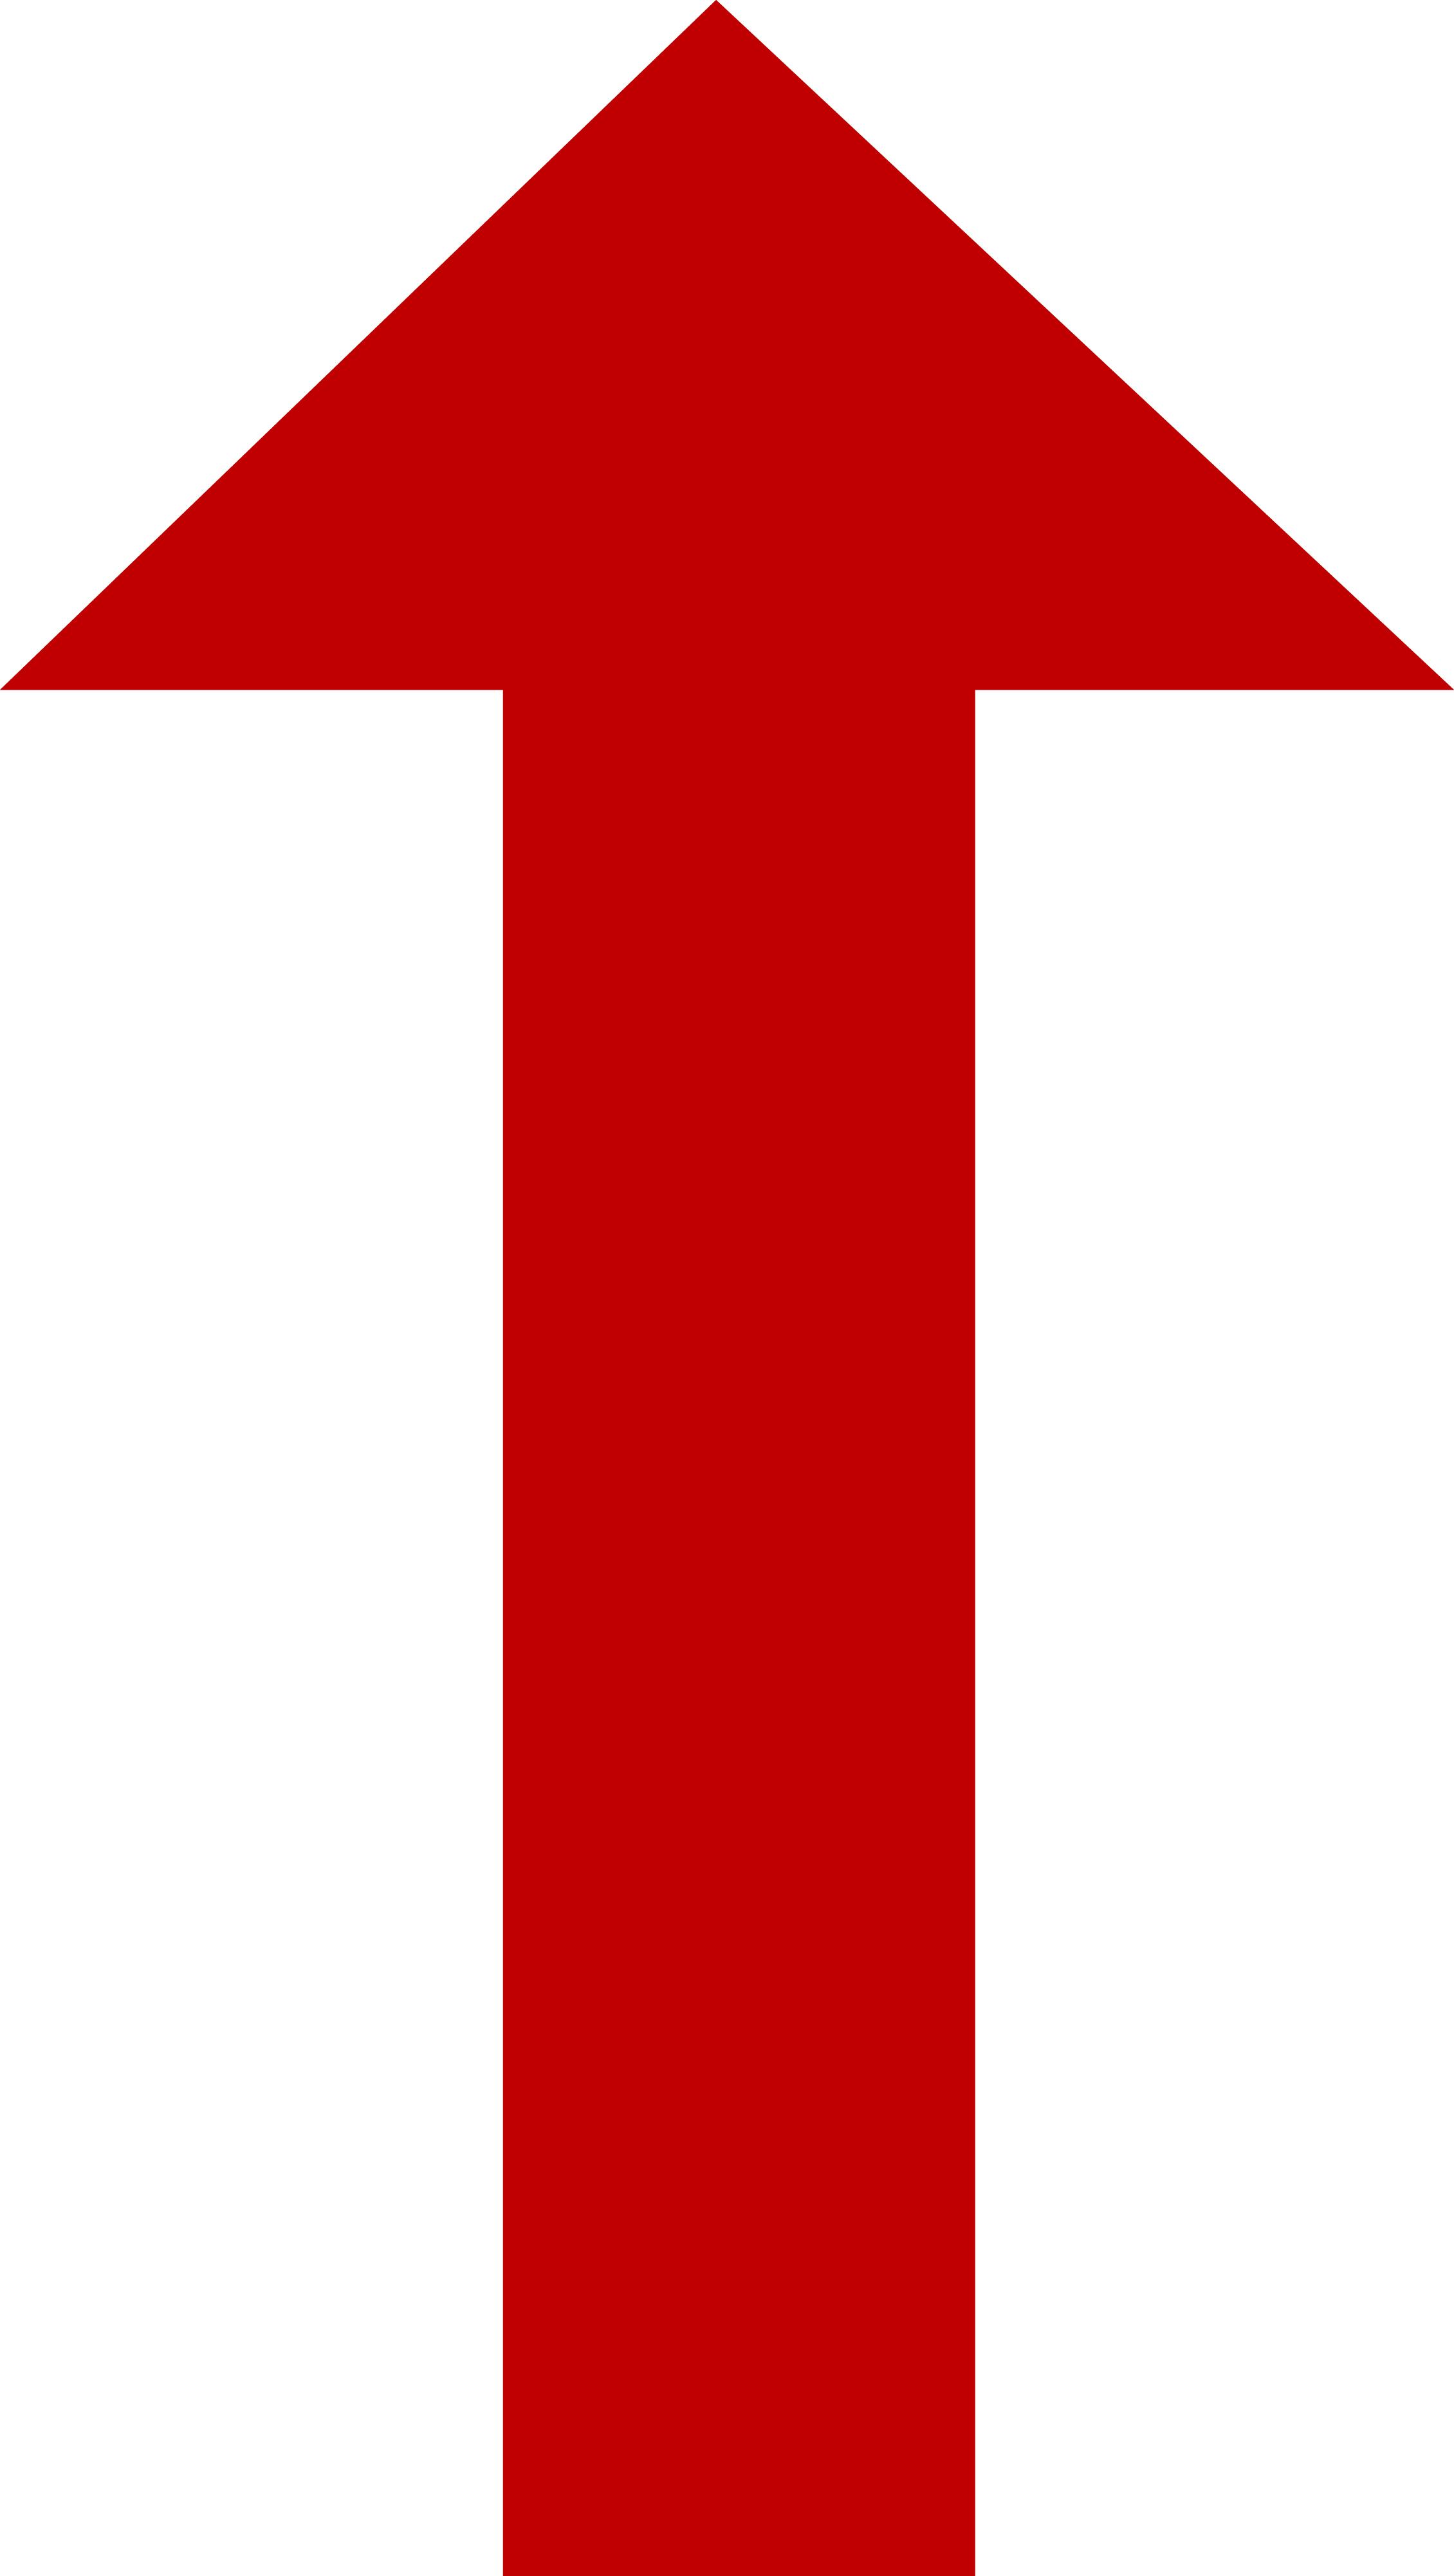 Arrow jpg banner freeuse library Tag:0x007f898f059a40>, #<Tag:0x007f898f02f0d8> and #<Tag ... banner freeuse library